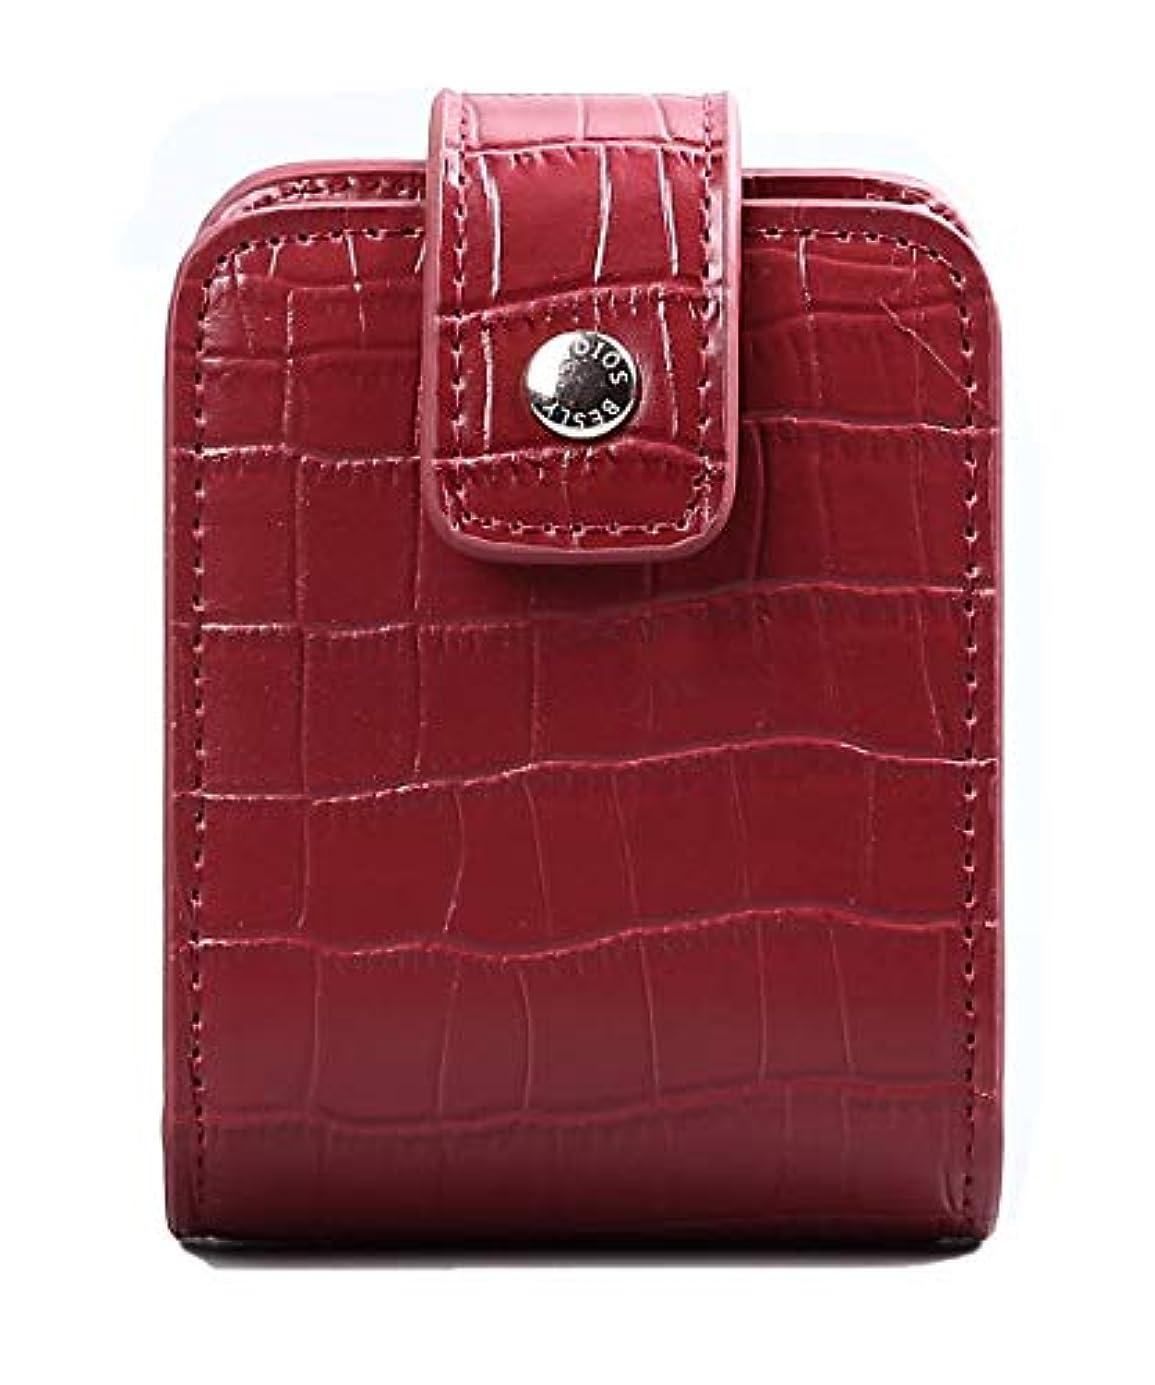 BESLY 女性用リップ化粧ポーチ リップを収納する ミニサイズ 携帯しやすい 人工製 赤 ワニ革を真似する牛革